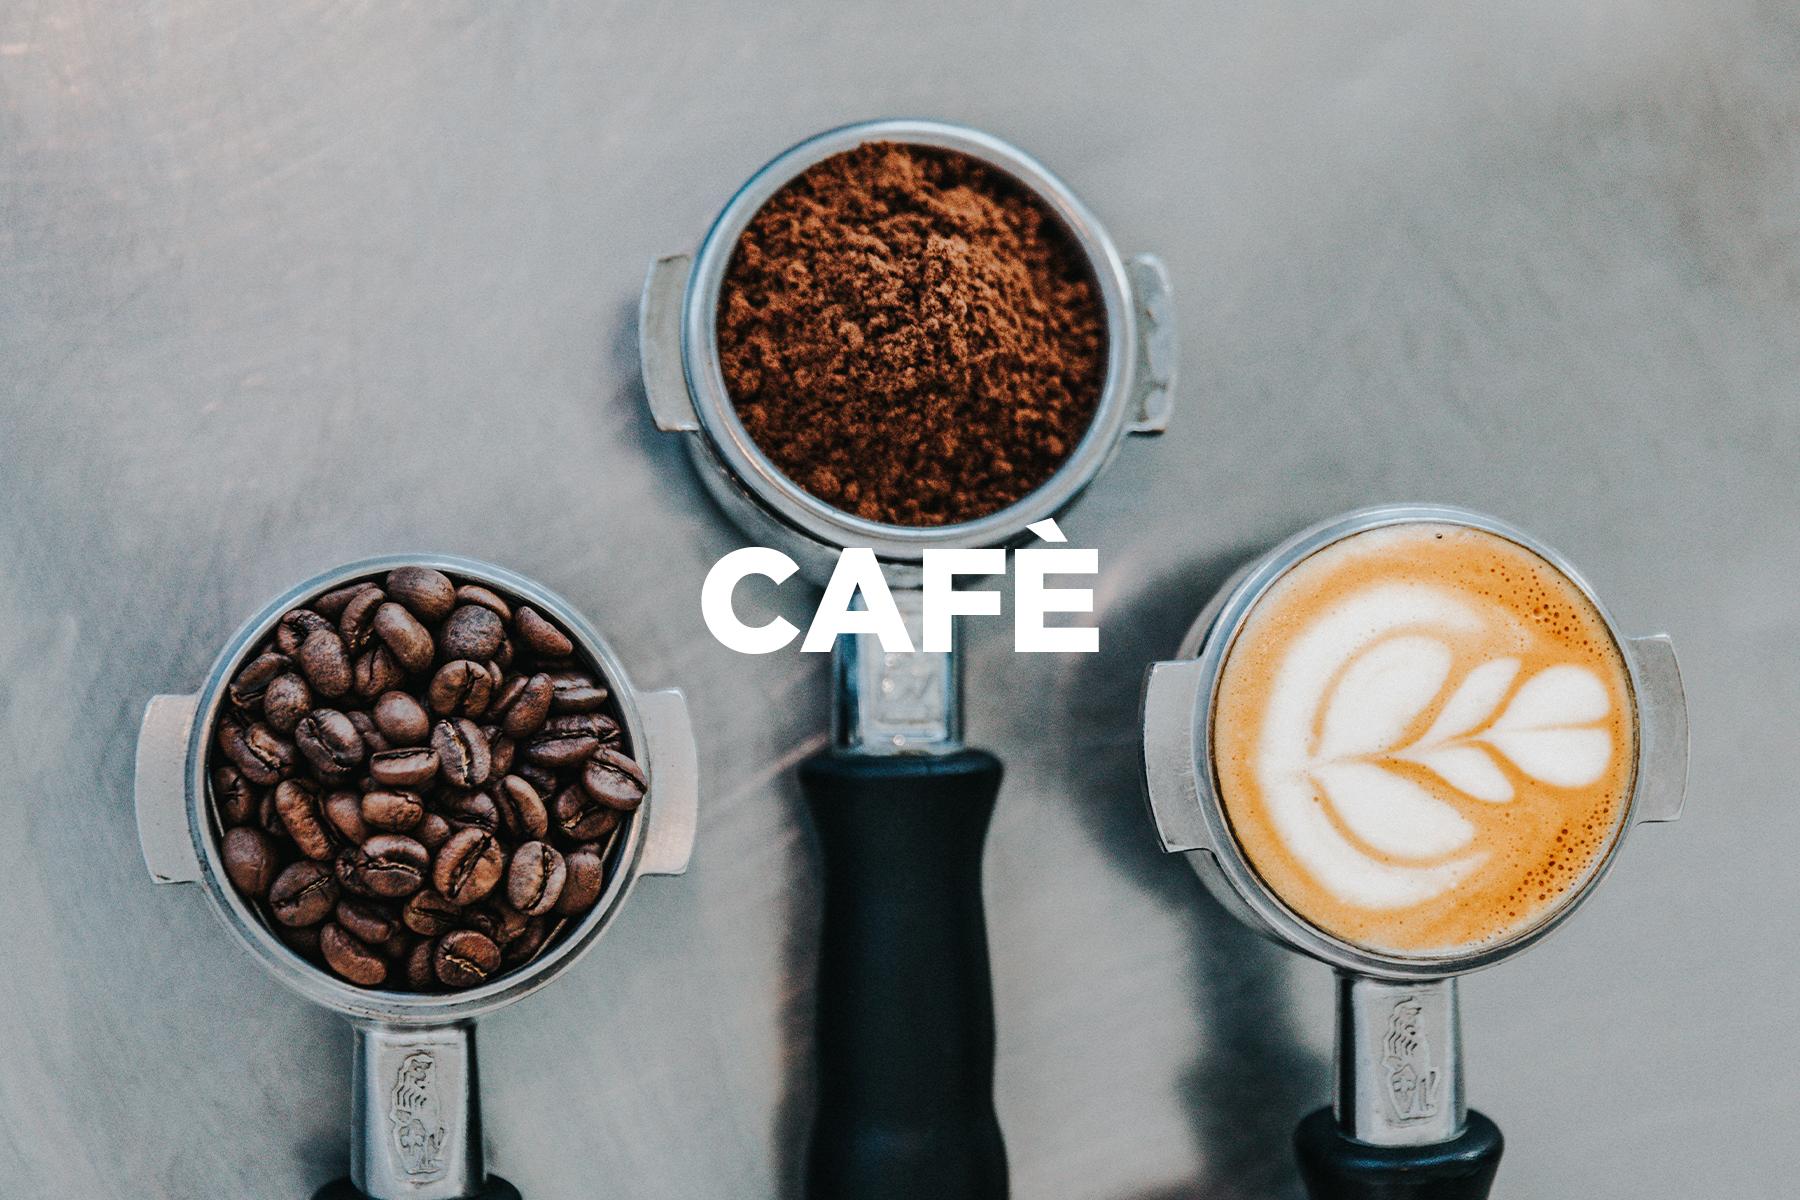 3x2-cafe.jpg